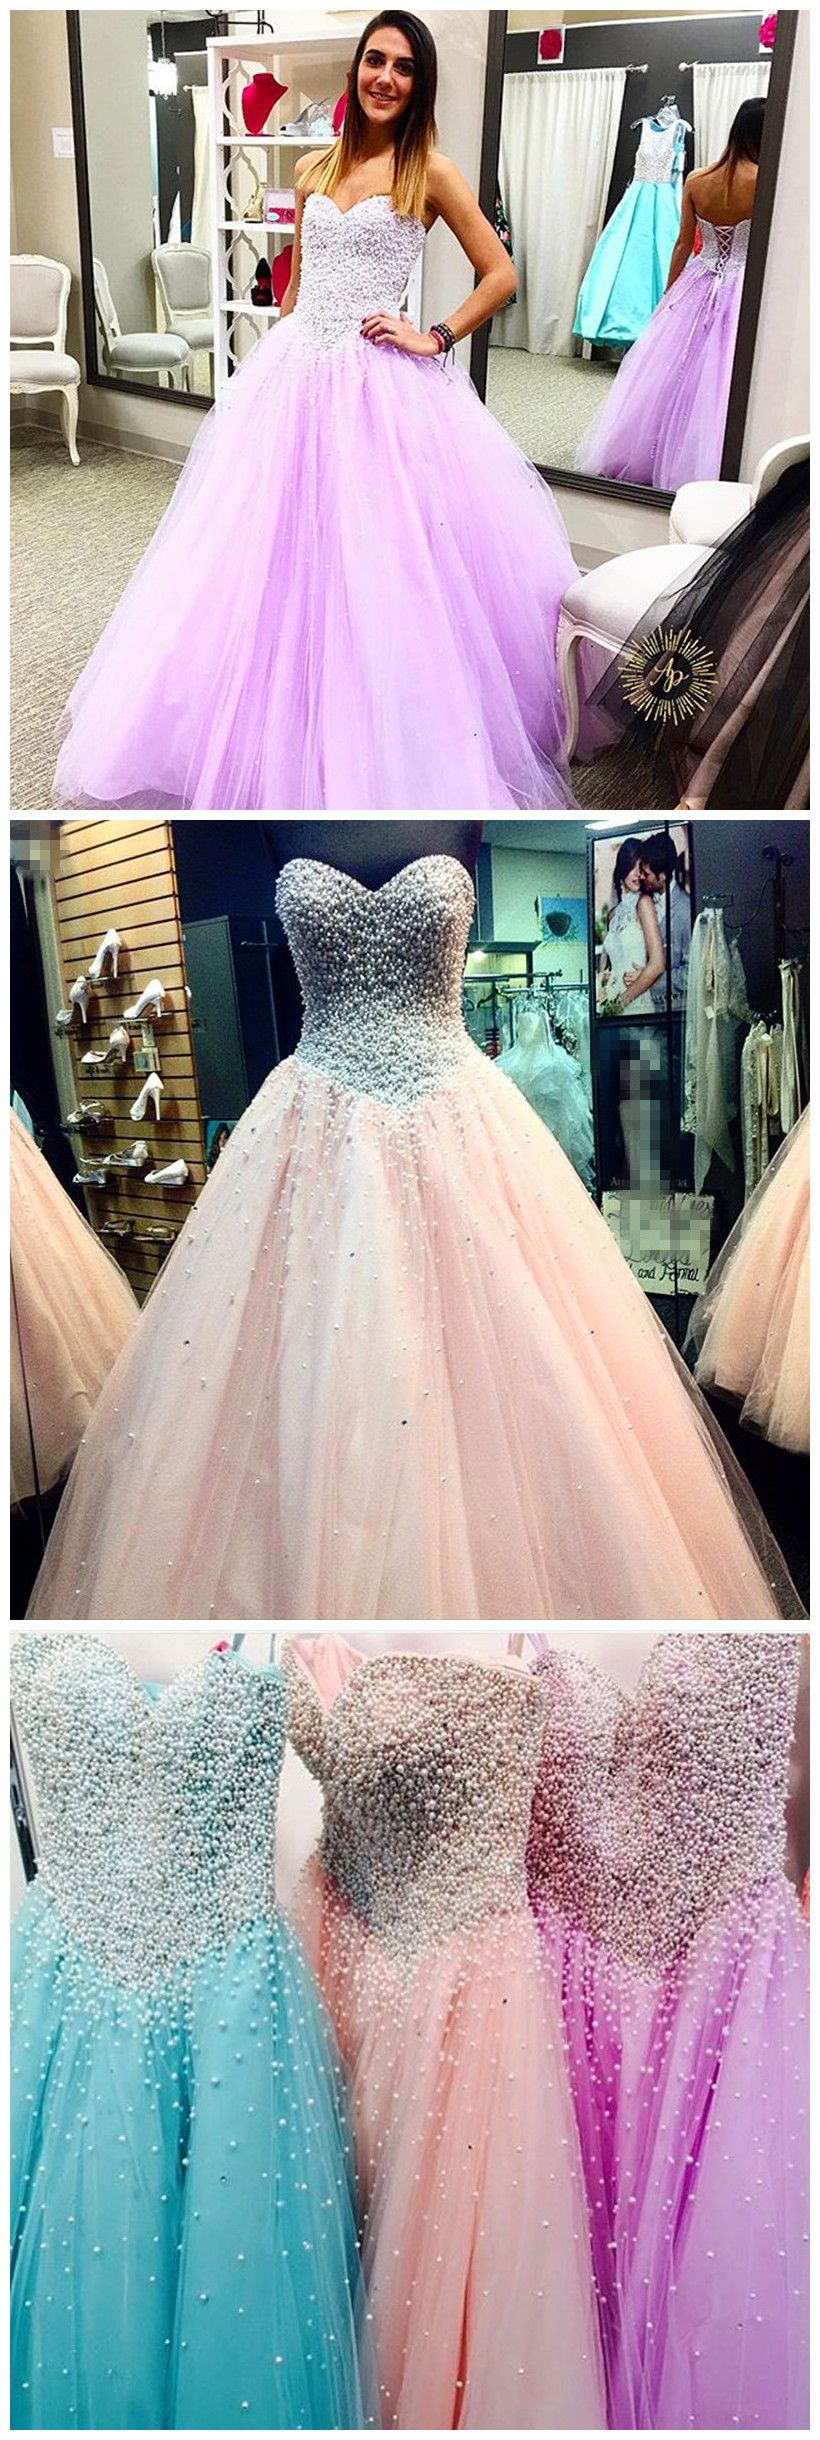 New arrival prom dressmodest prom dresselegant pearl beaded